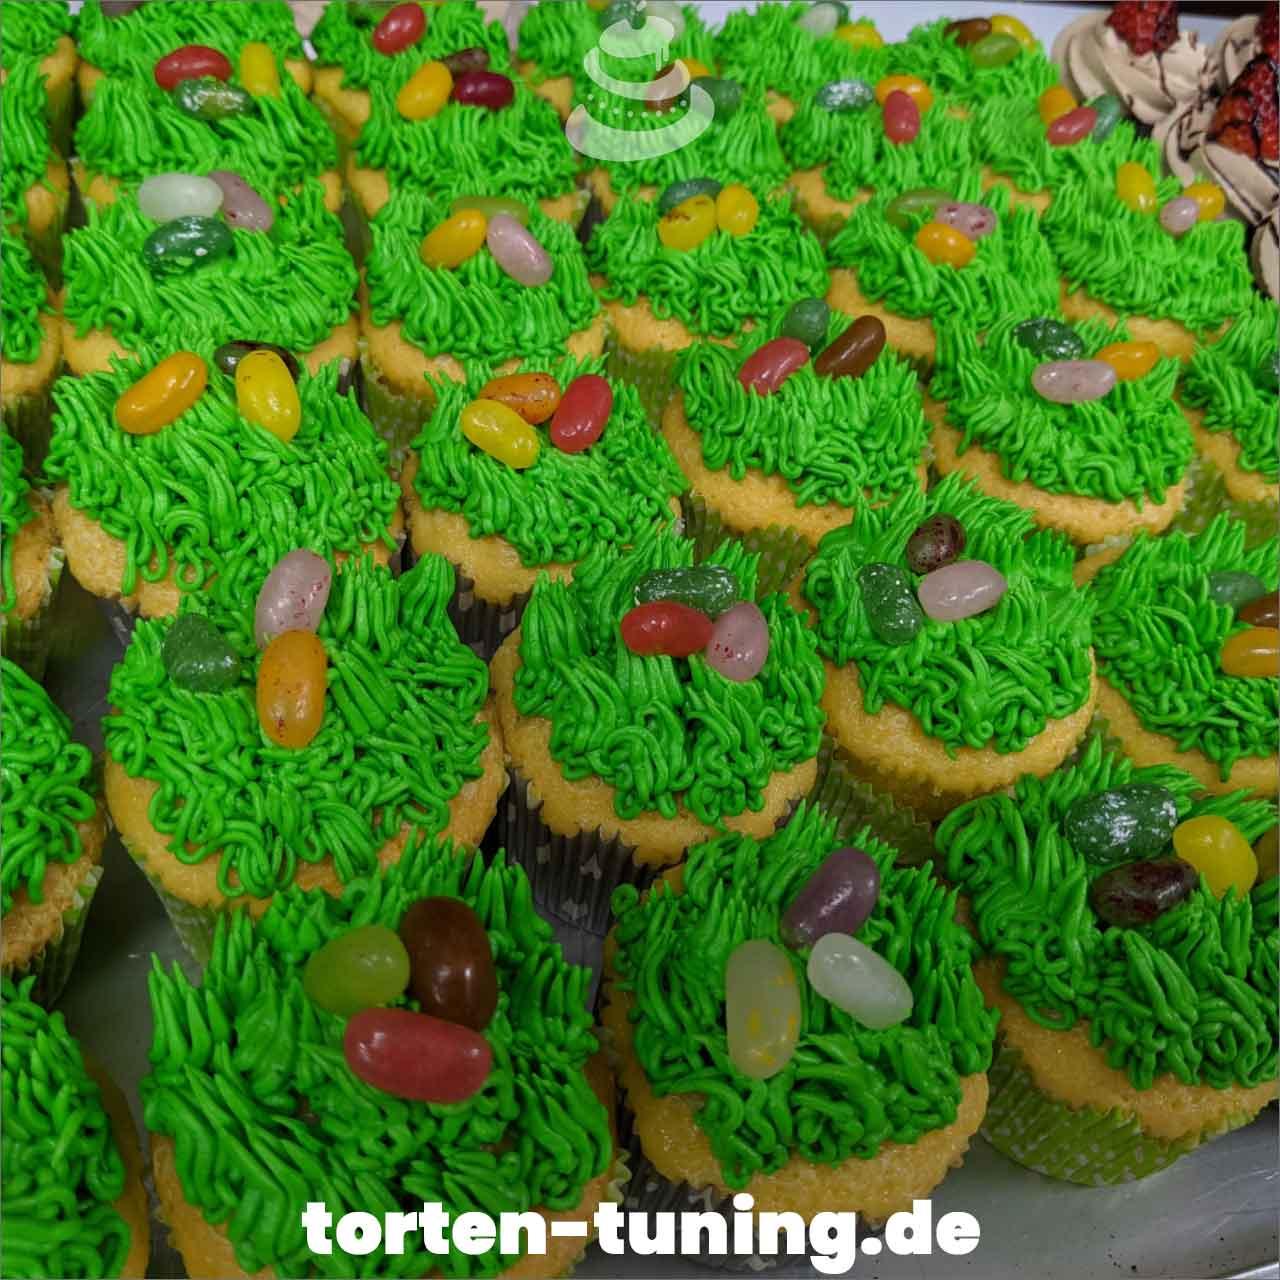 Ostercupcakes Dripcake Obsttorte Geburtstagstorte Motivtorte Torte Tortendekoration Torte online bestellen Suhl Thüringen Torten Tuning Sahnetorte Tortenfiguren Cake Topper